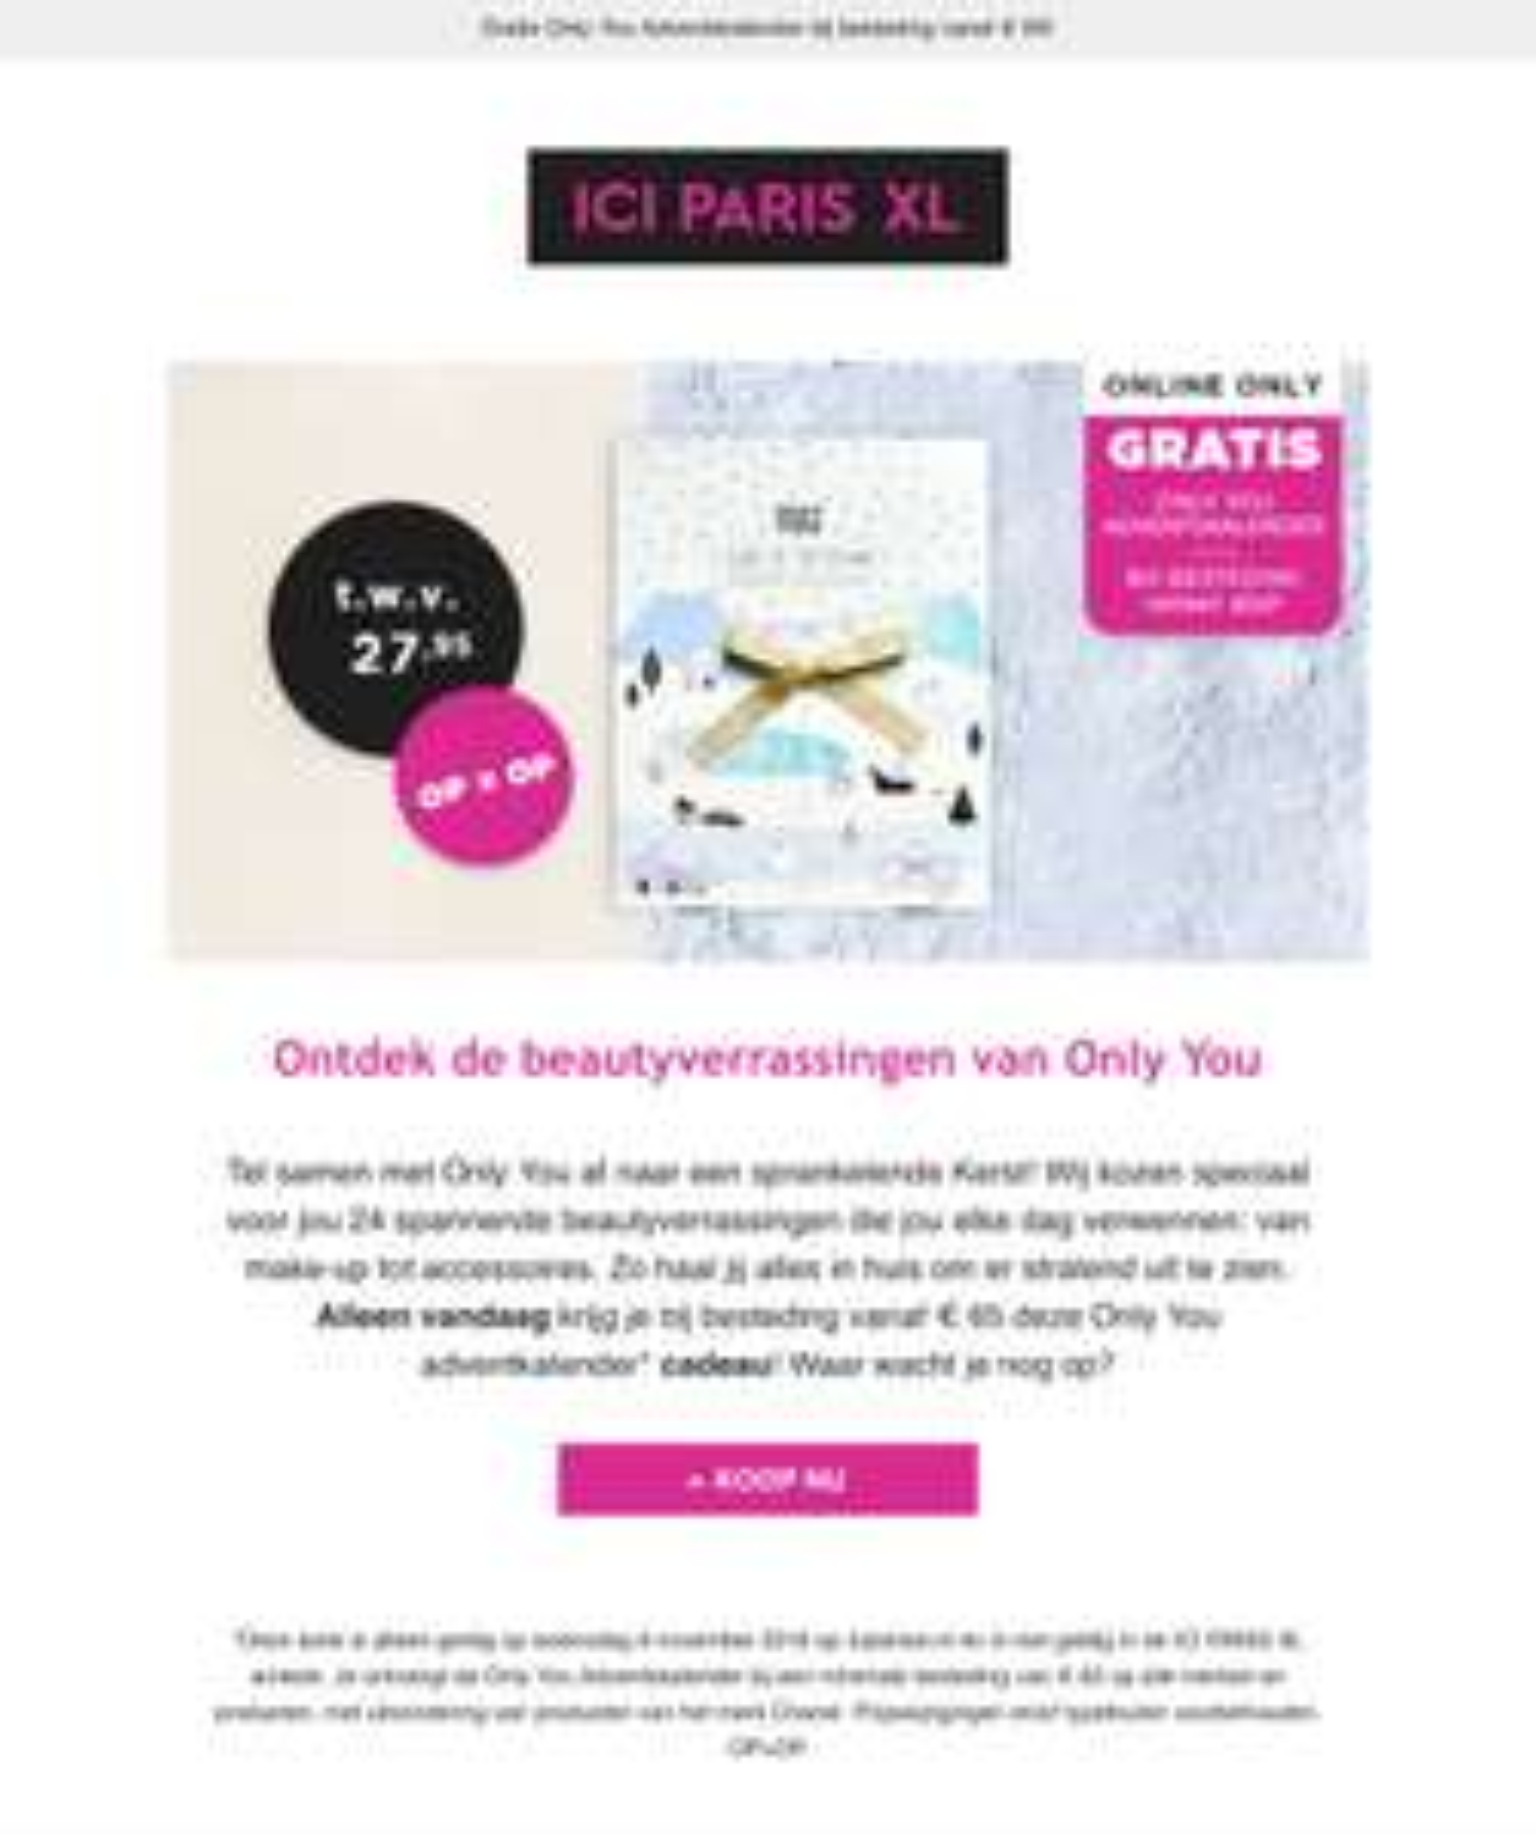 bij besteding vanaf € 65 deze Only You adventkalender (twv. €27,95) cadeau ici paris